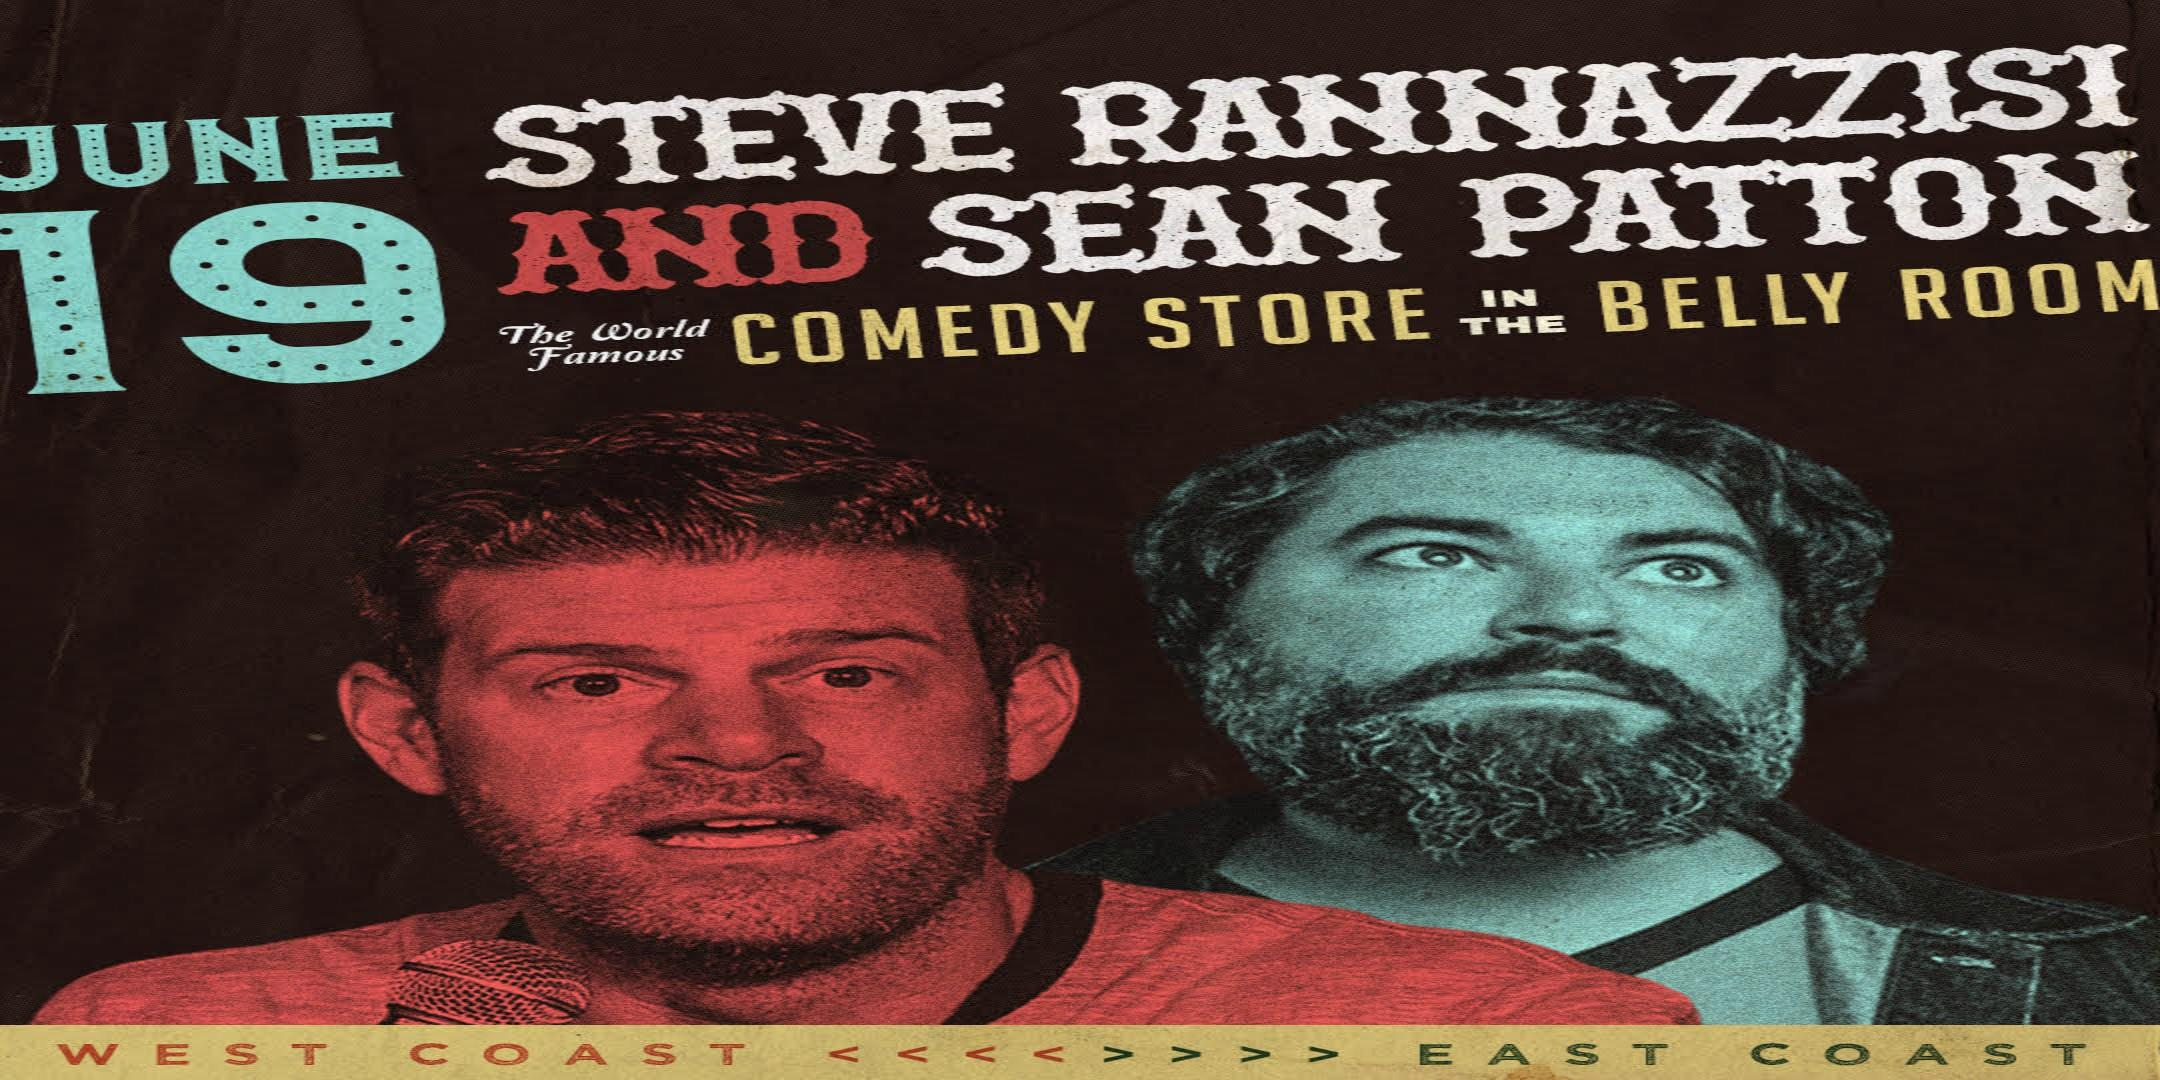 Steve Rannazzisi & Sean Patton